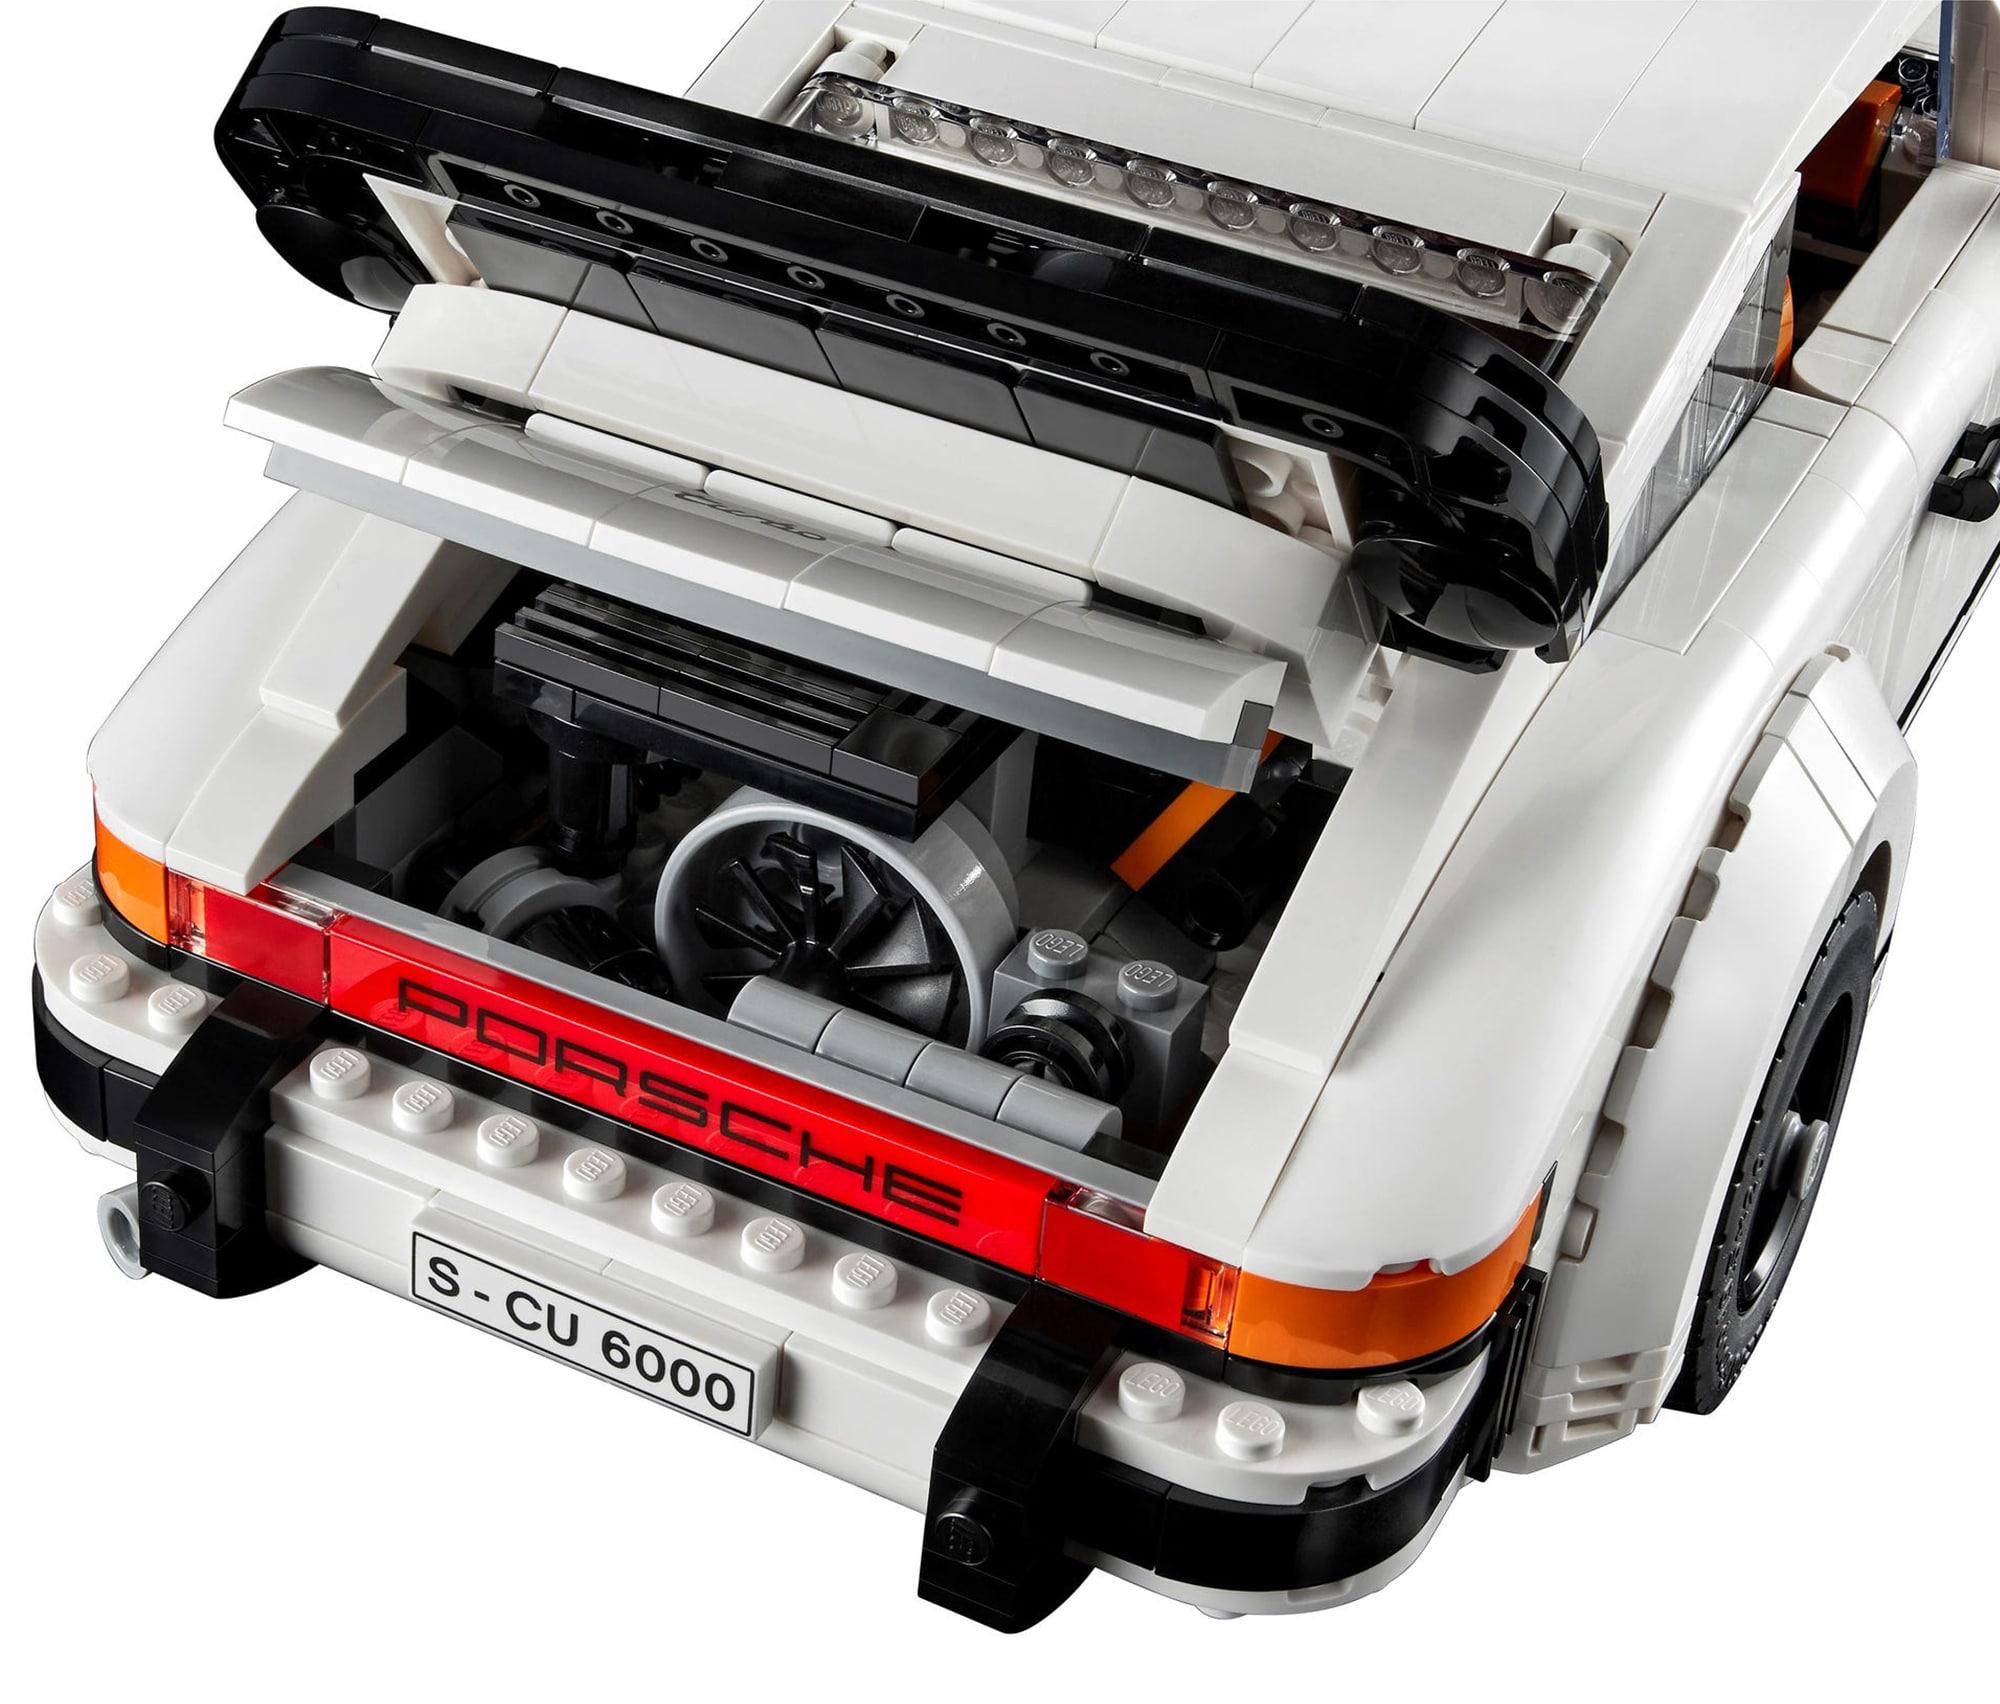 LEGO 10295 Porsche 911 Turbo Heck